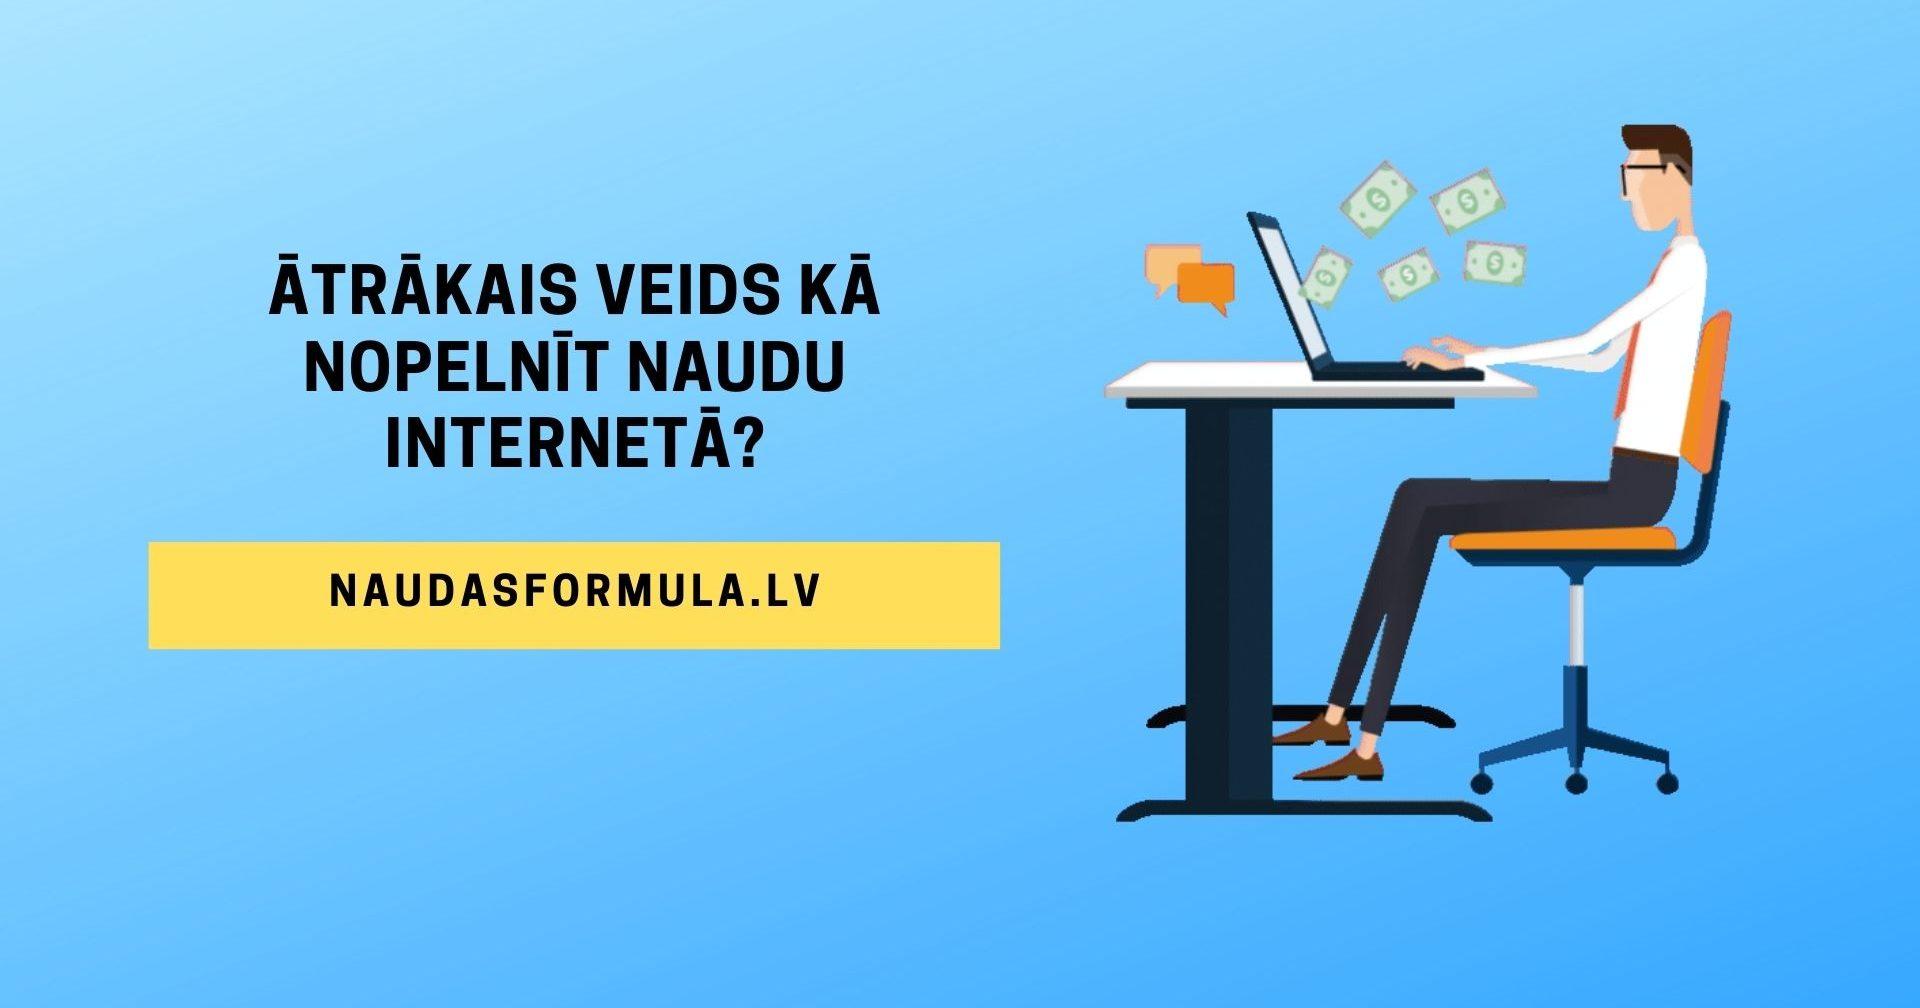 interneta bizness pelna naudu)